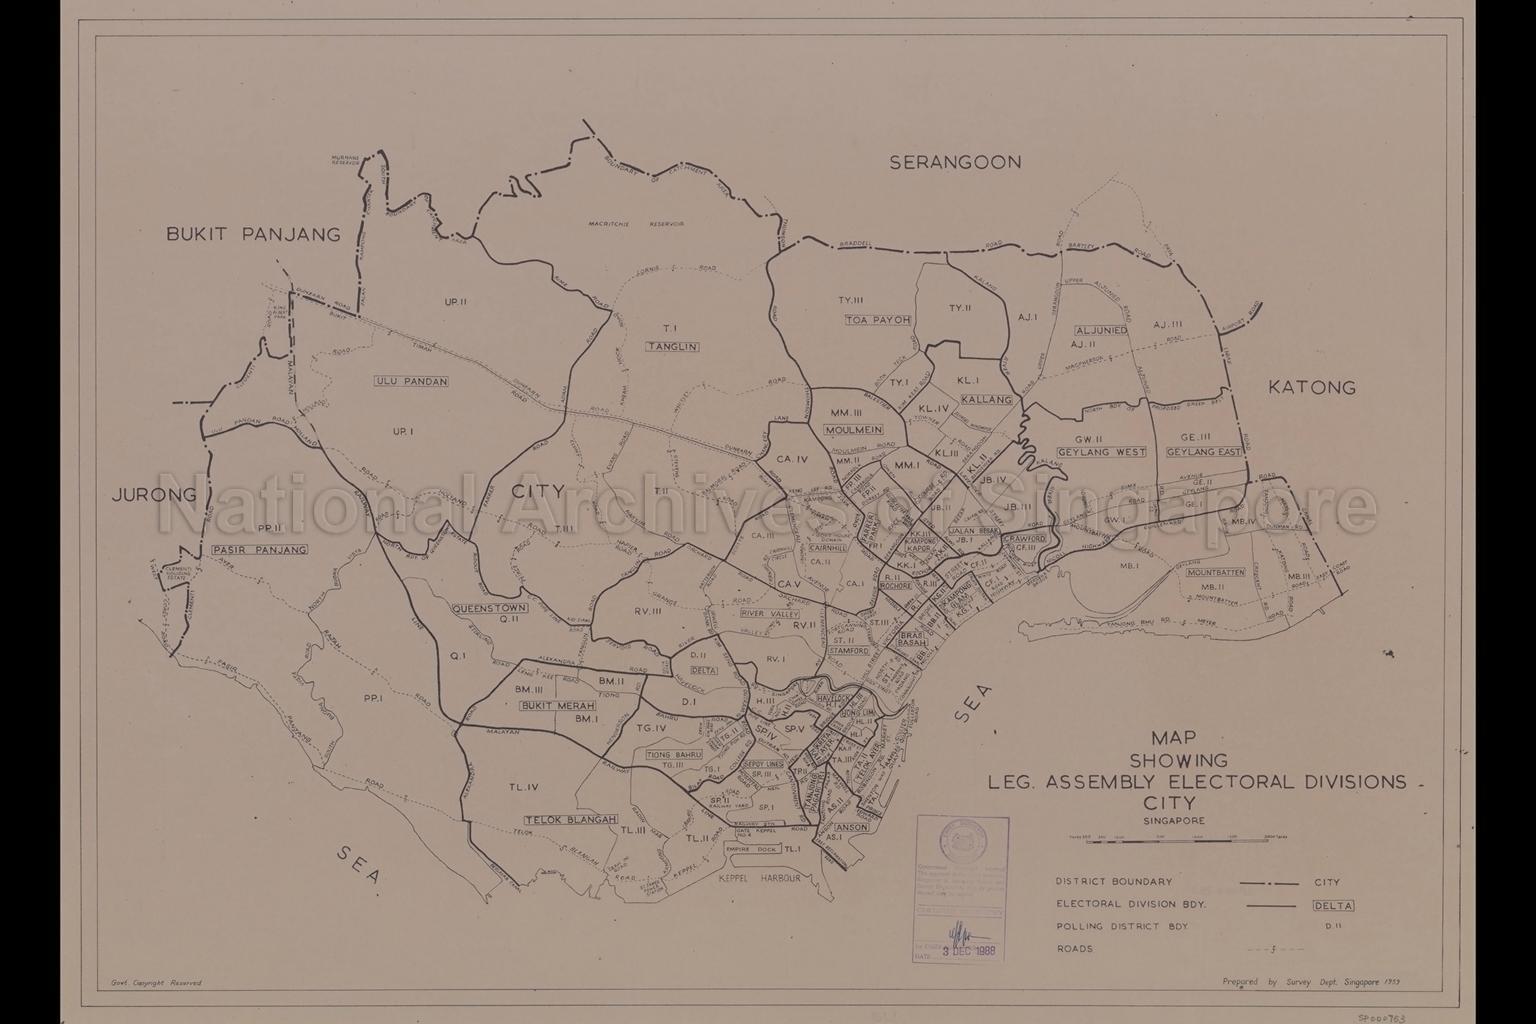 Legislative Assembly electoral Divisions. City (of)  …